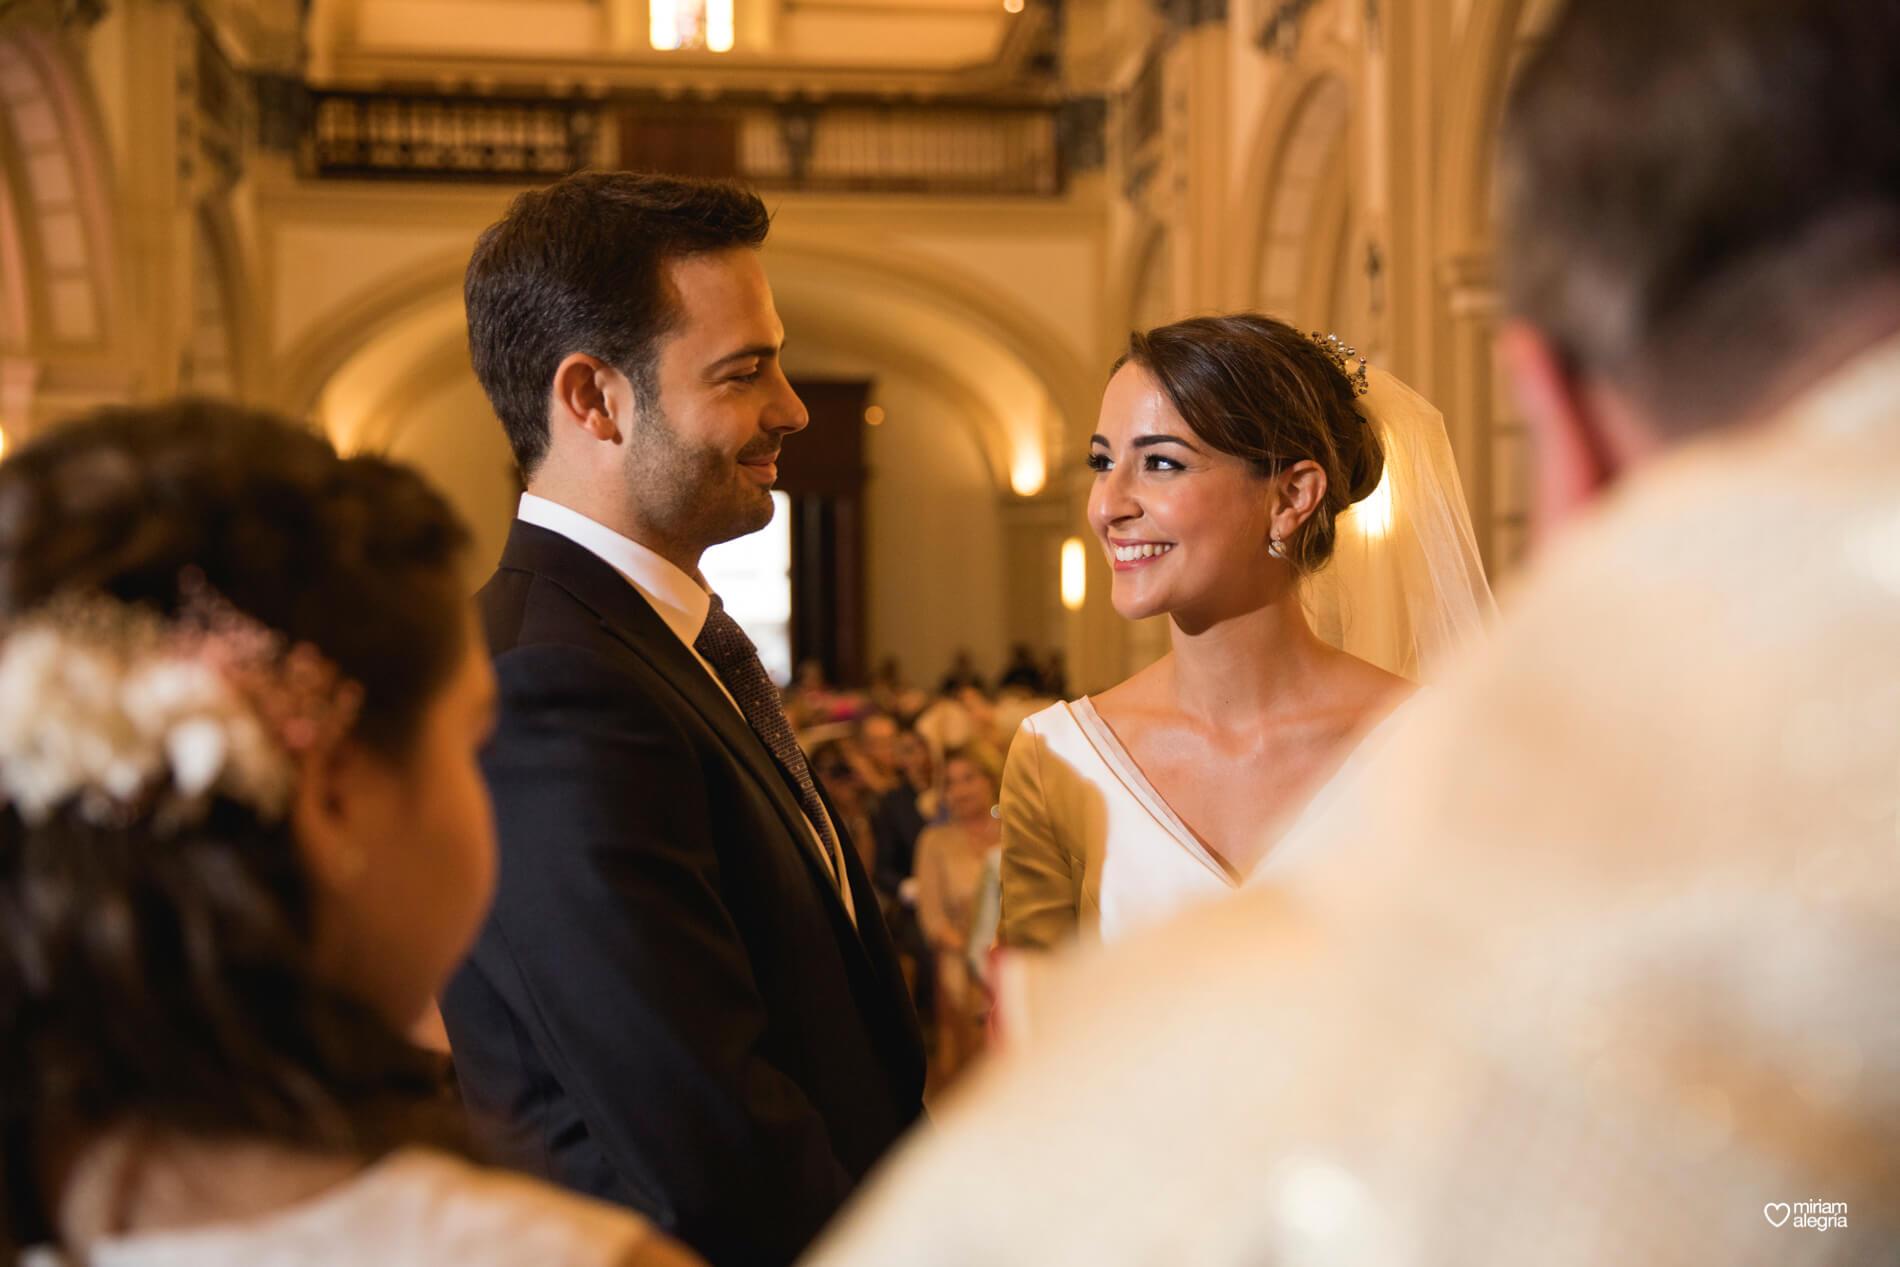 vestido-de-novia-paula-del-vas-miriam-alegria-fotografos-boda-murcia-58